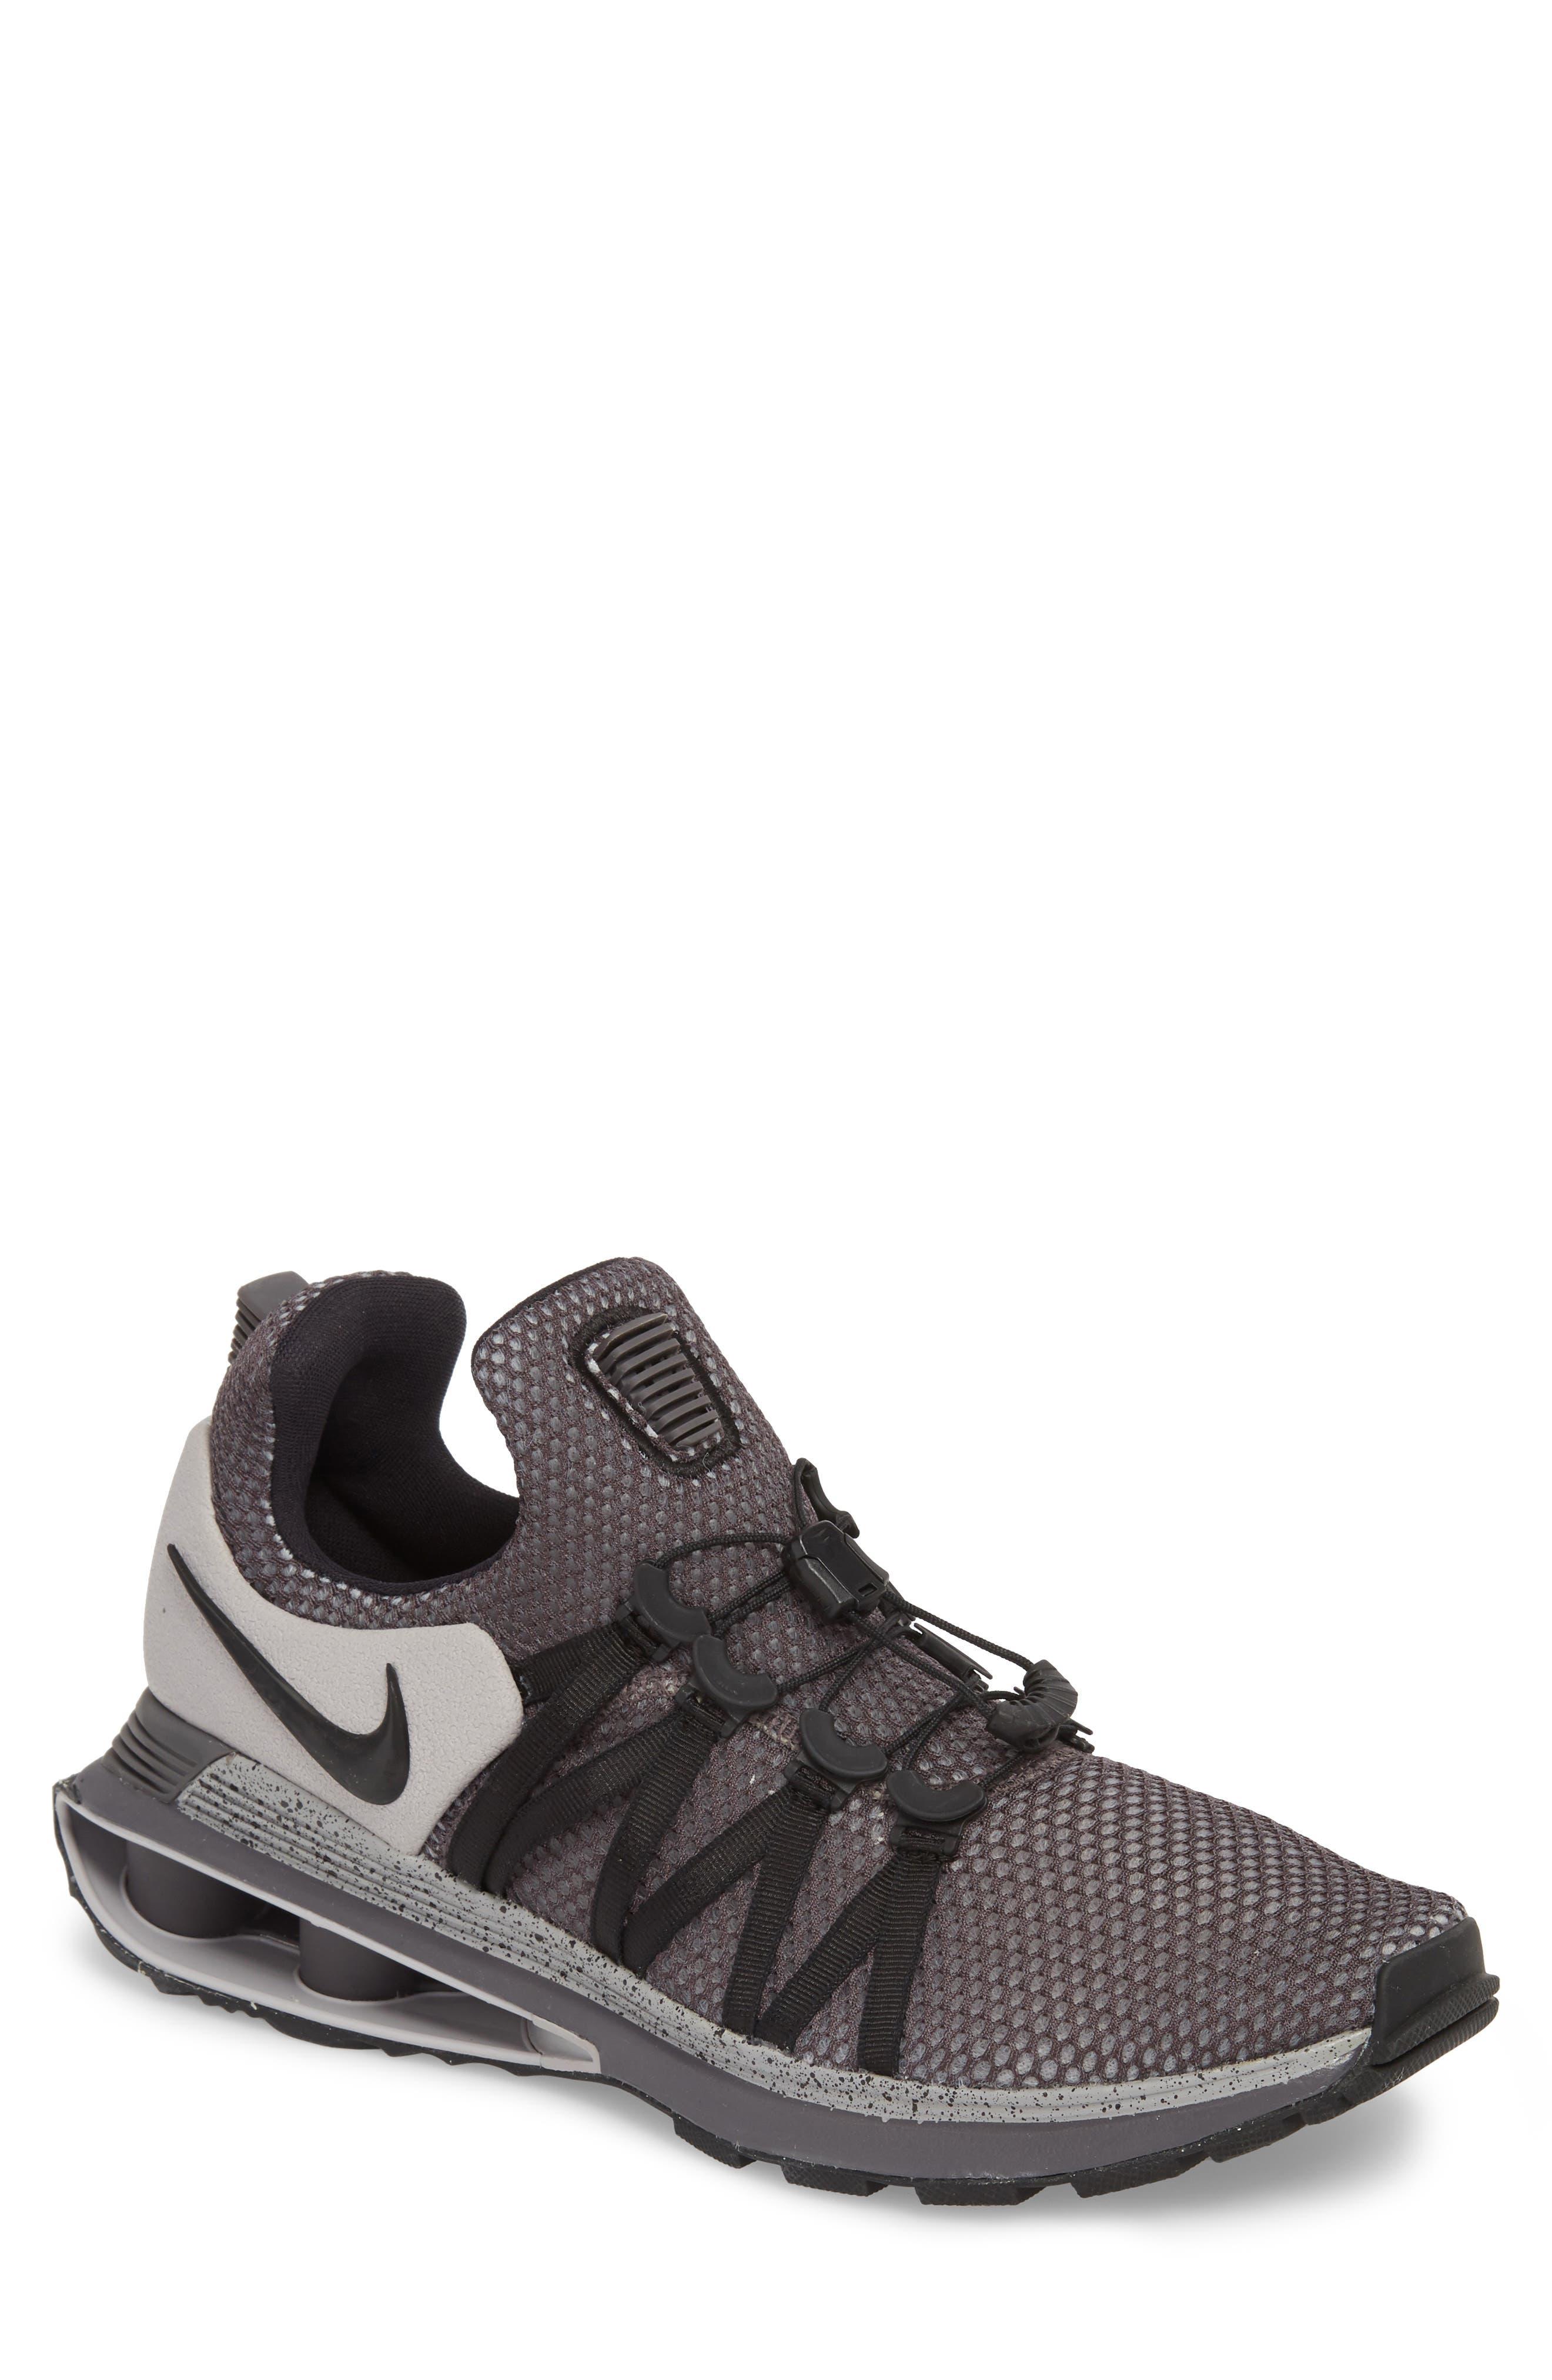 Shox Gravity Sneaker,                         Main,                         color, ATMOSPHERE GREY/ BLACK/ GREY